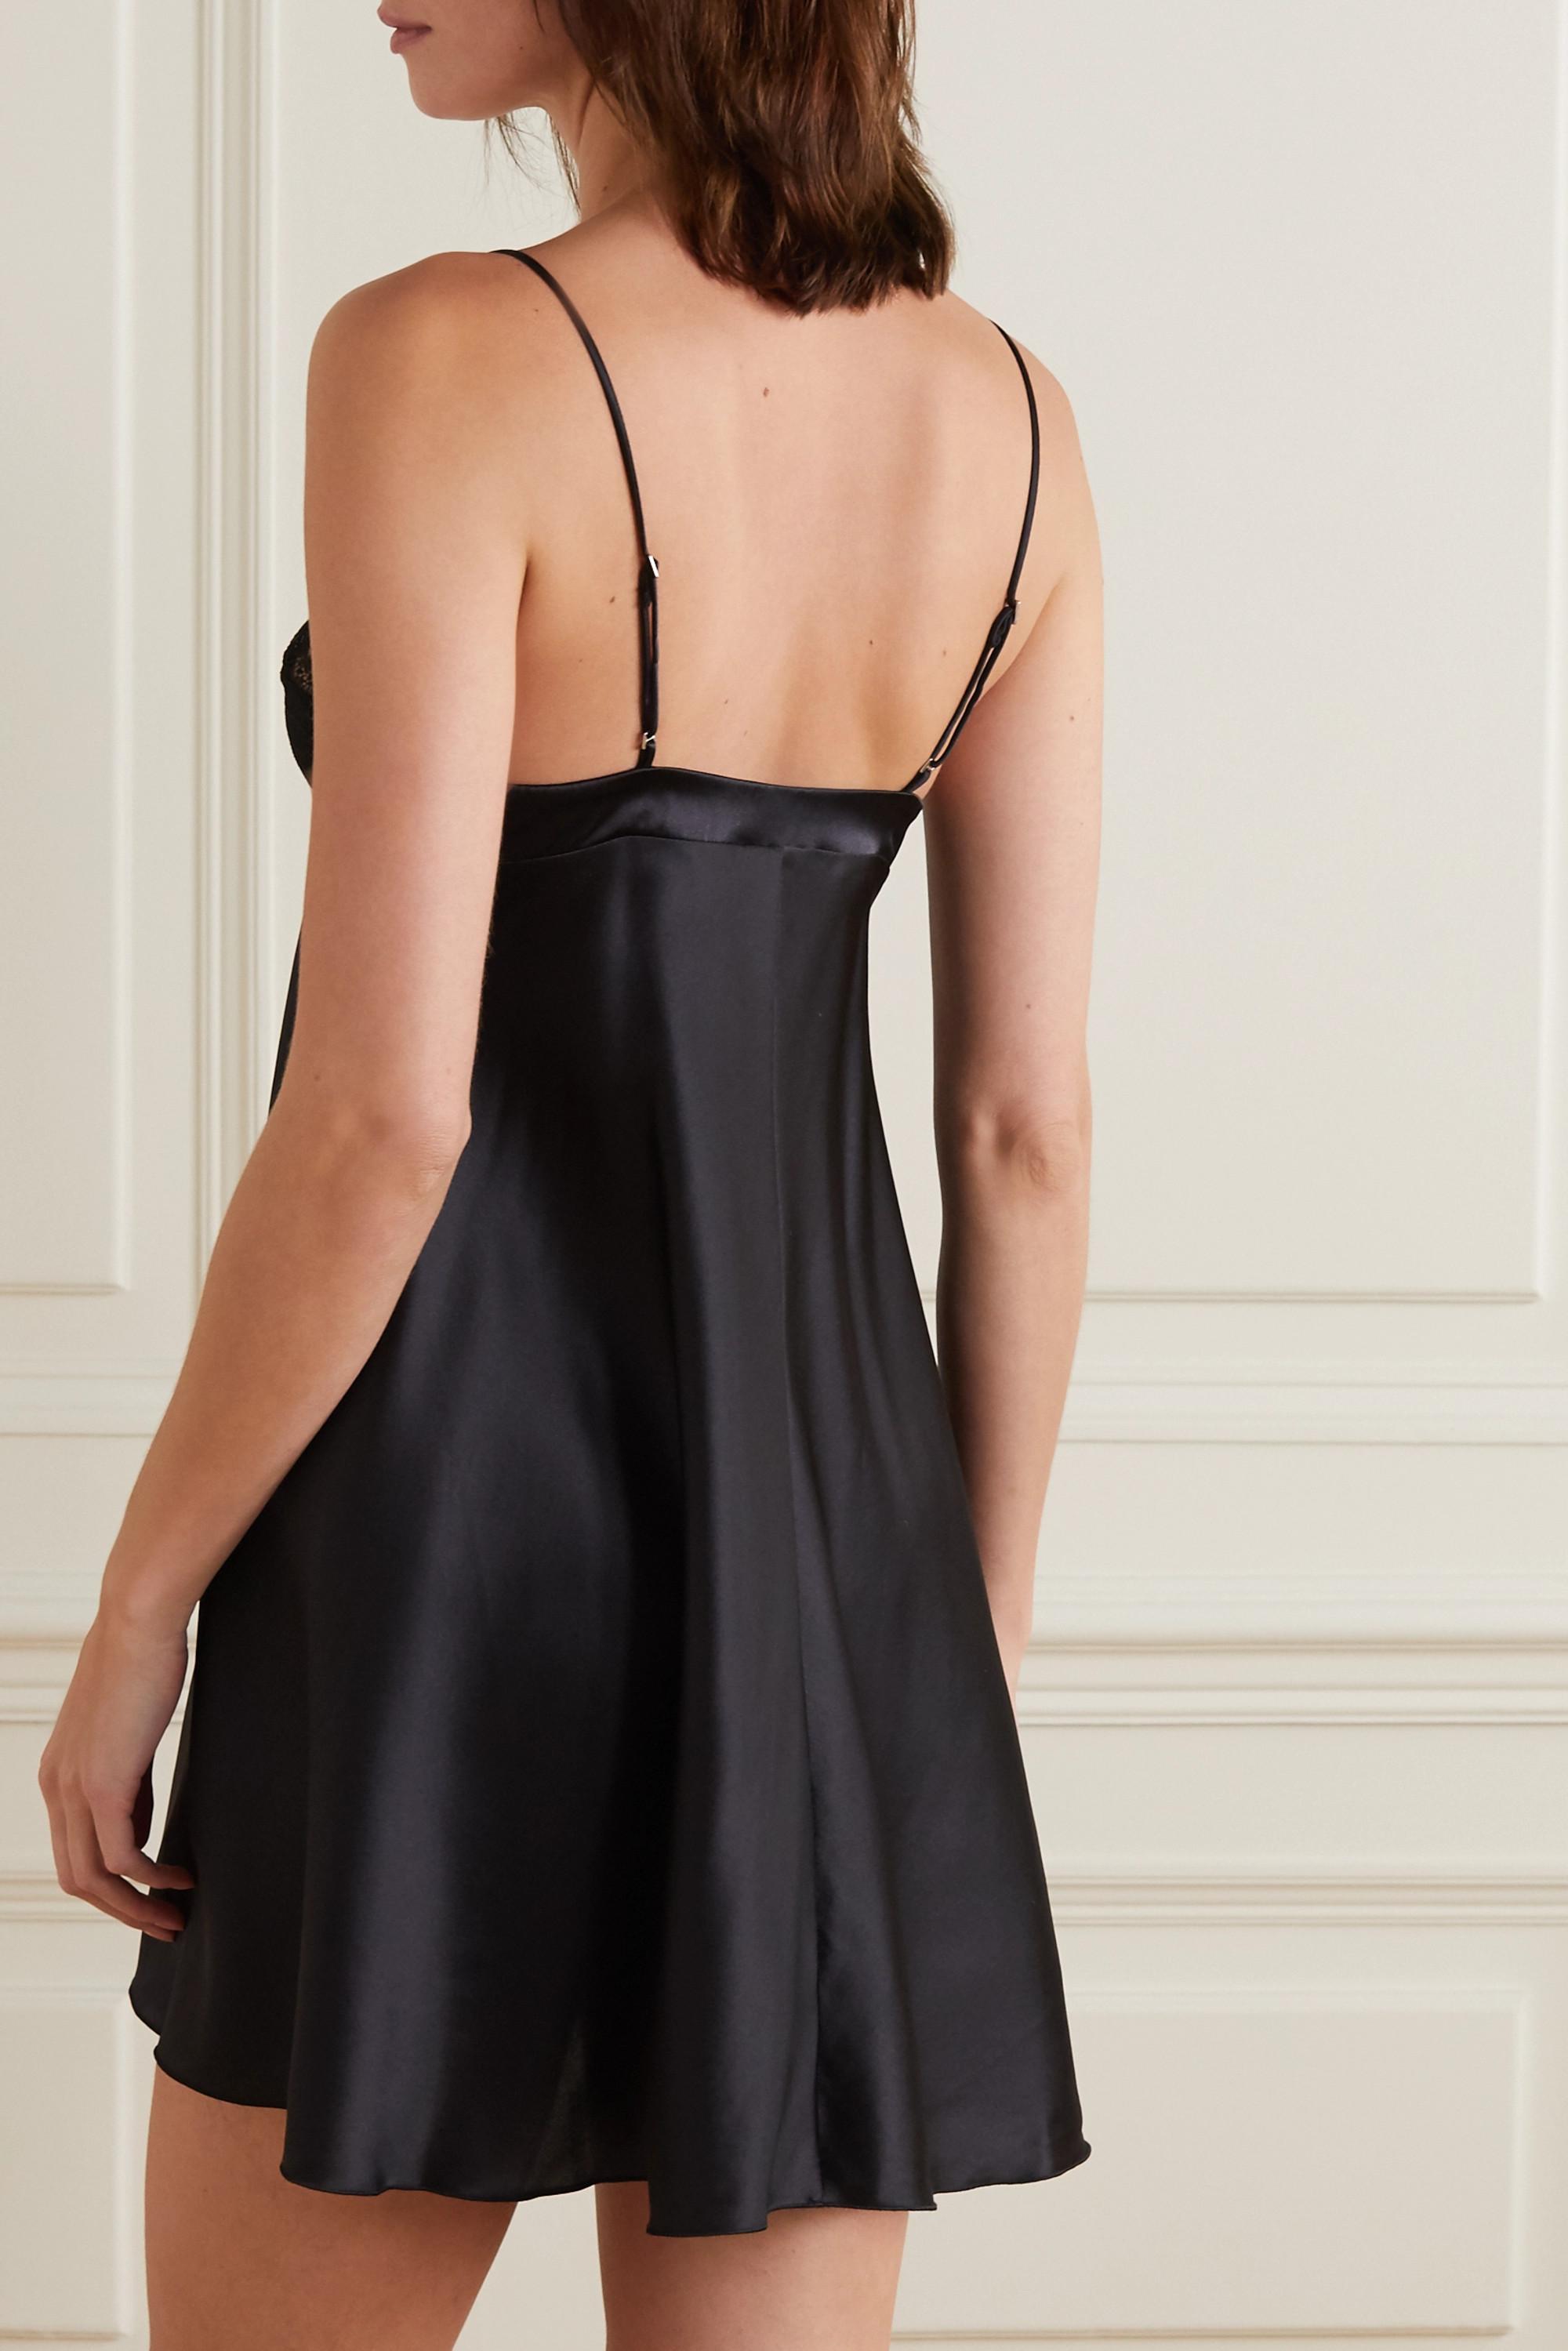 La Perla Adele Leavers lace-trimmed stretch-silk satin chemise